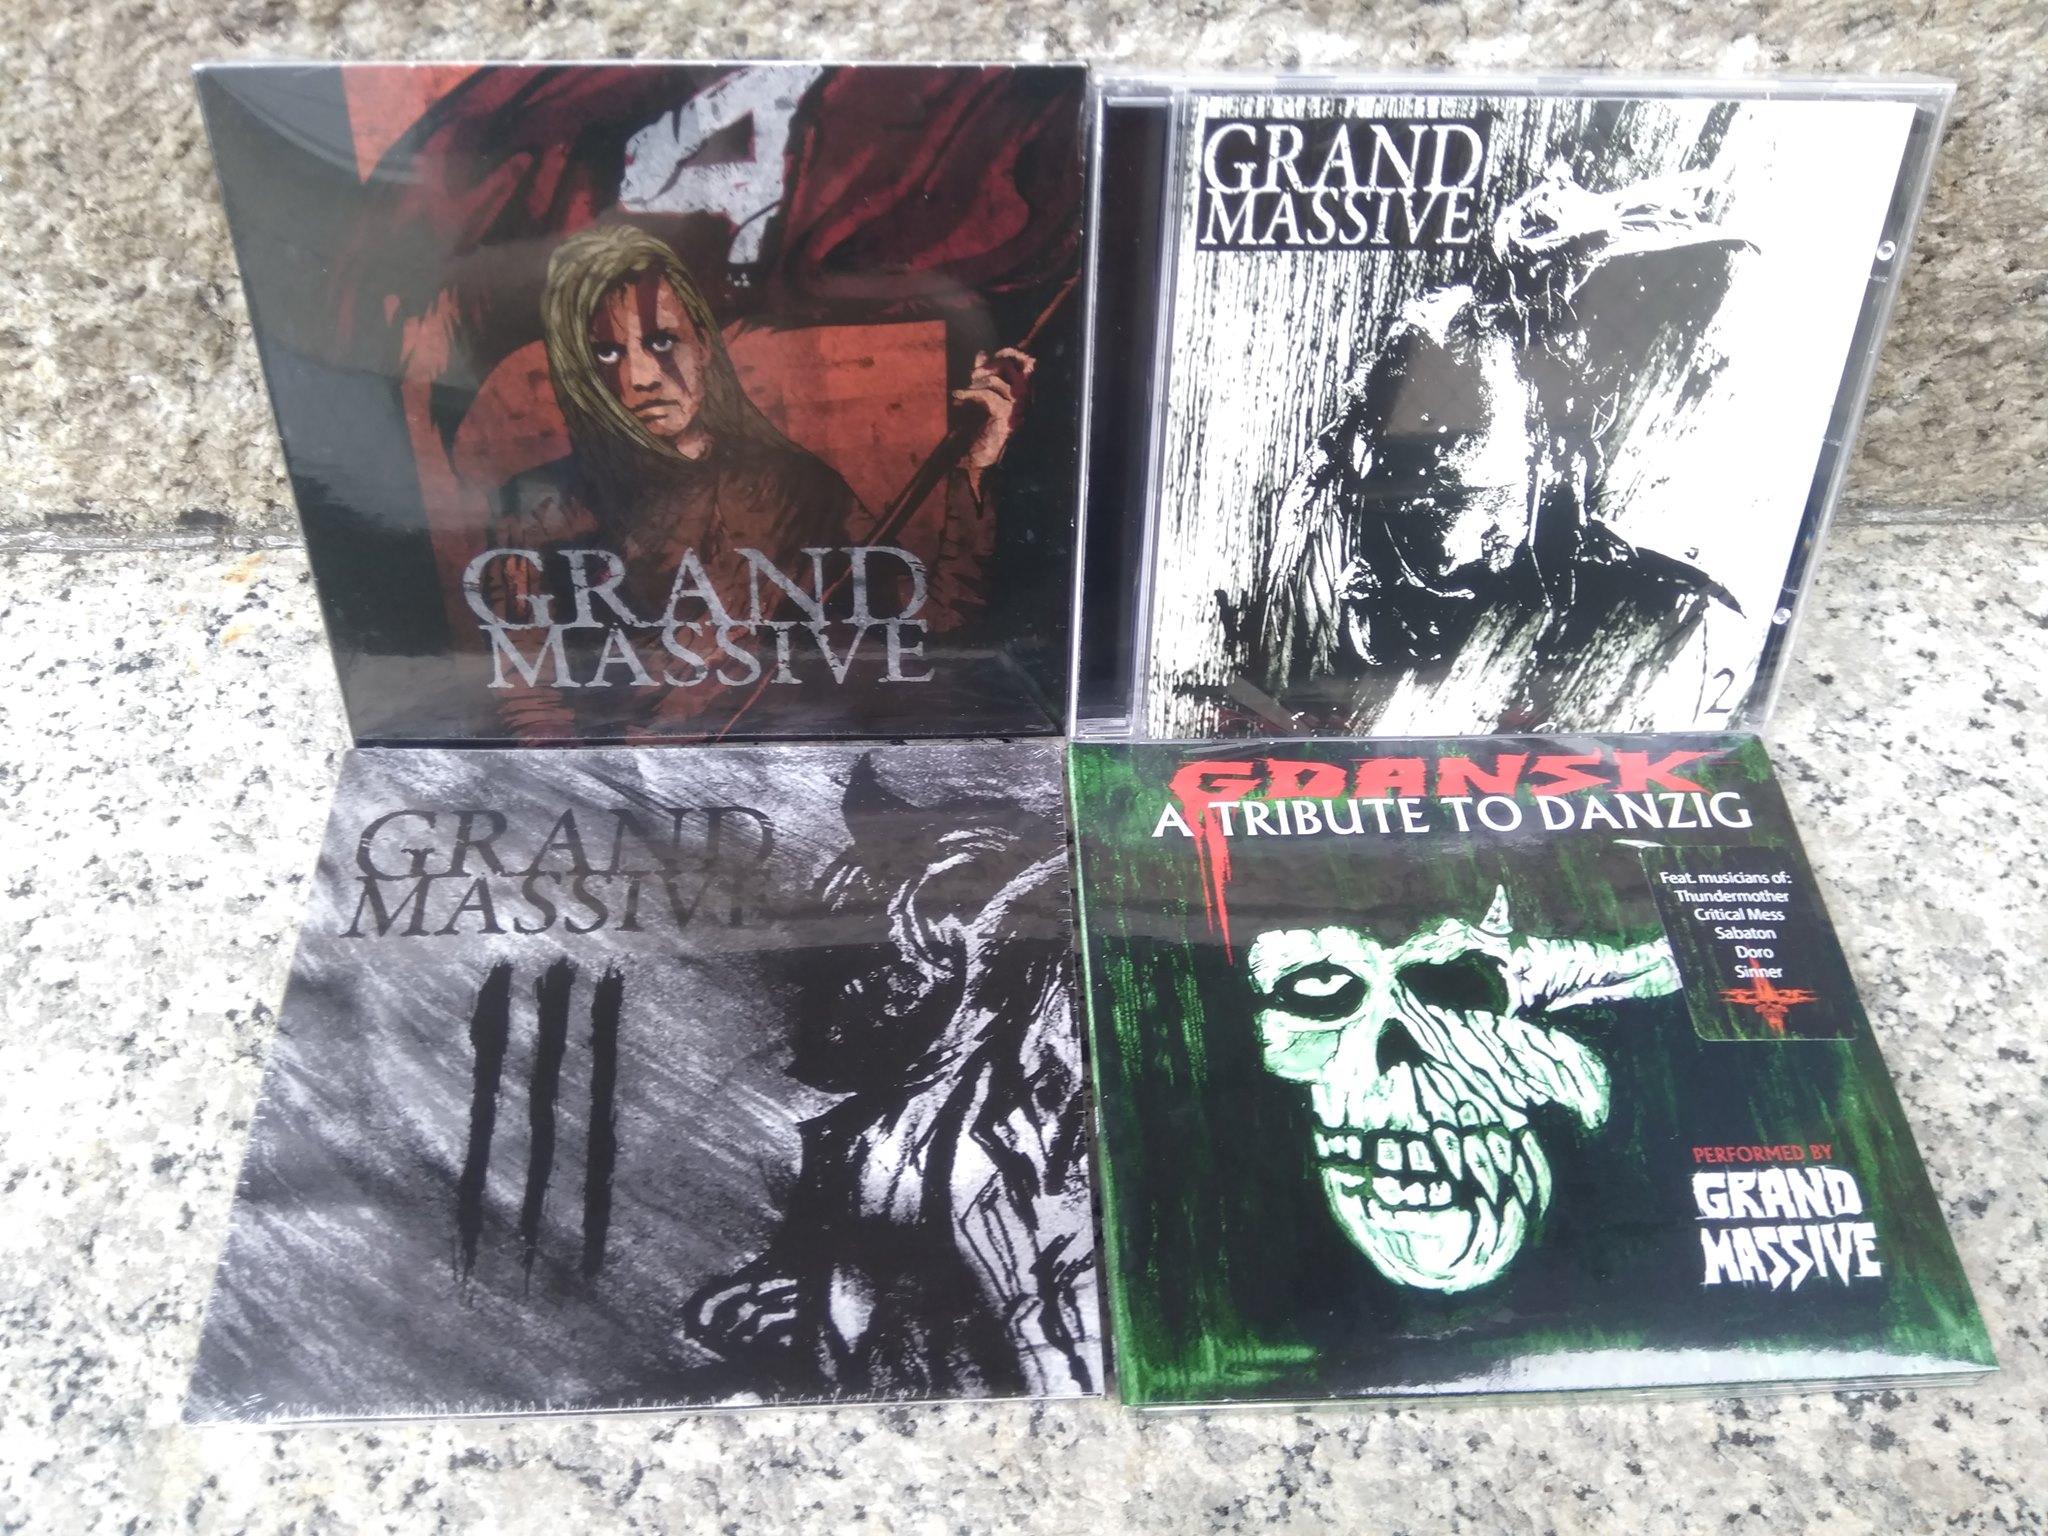 Alle 3 Grand Massive Alben + EP inkl. Versand für 20€ (2, III, A Tribute to Danzig & IV)